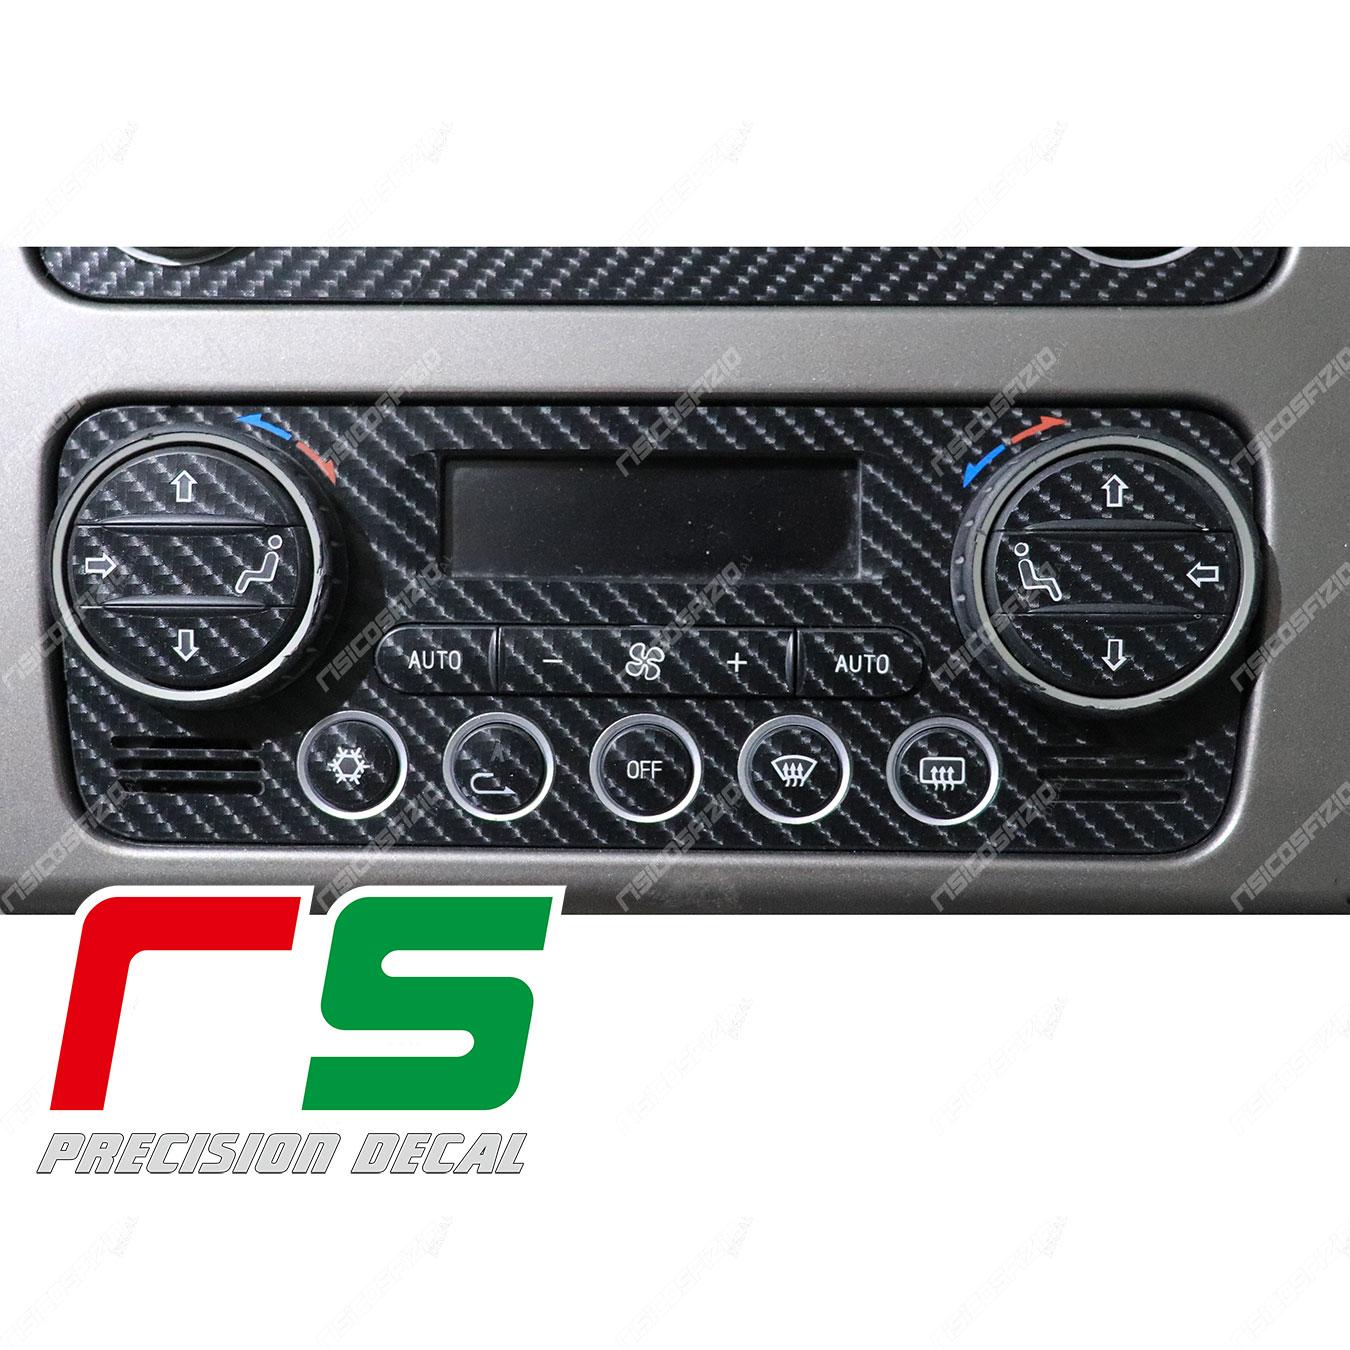 stickers Alfa Romeo 159 carbonlook Decal dual-zone air conditioner